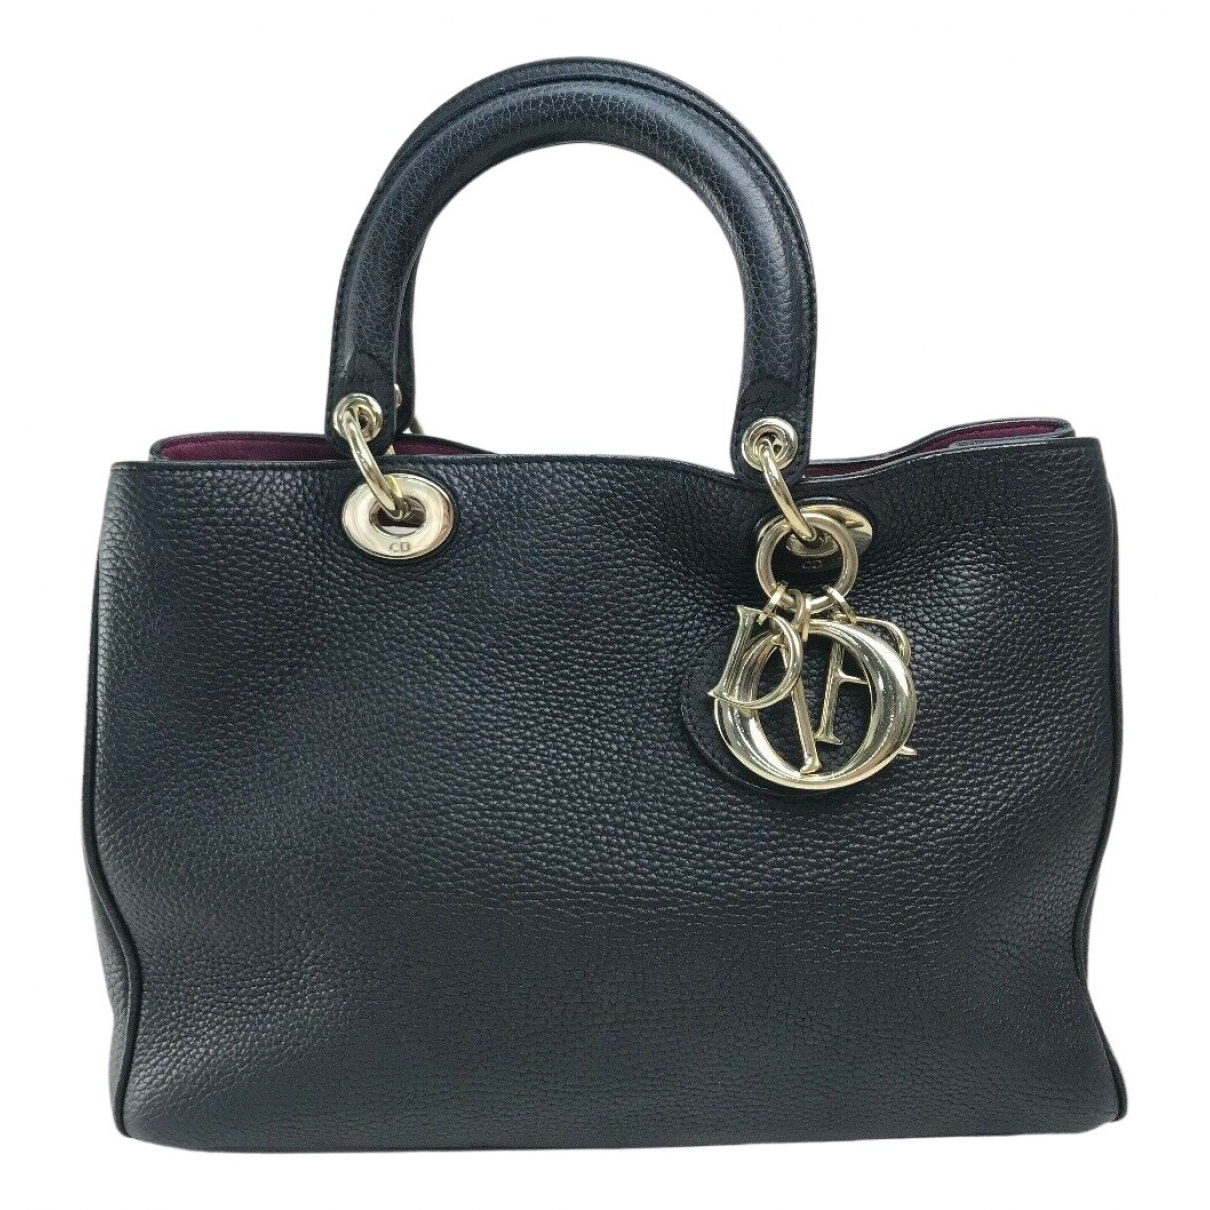 Dior Diorissimo Black Leather handbag for Women N